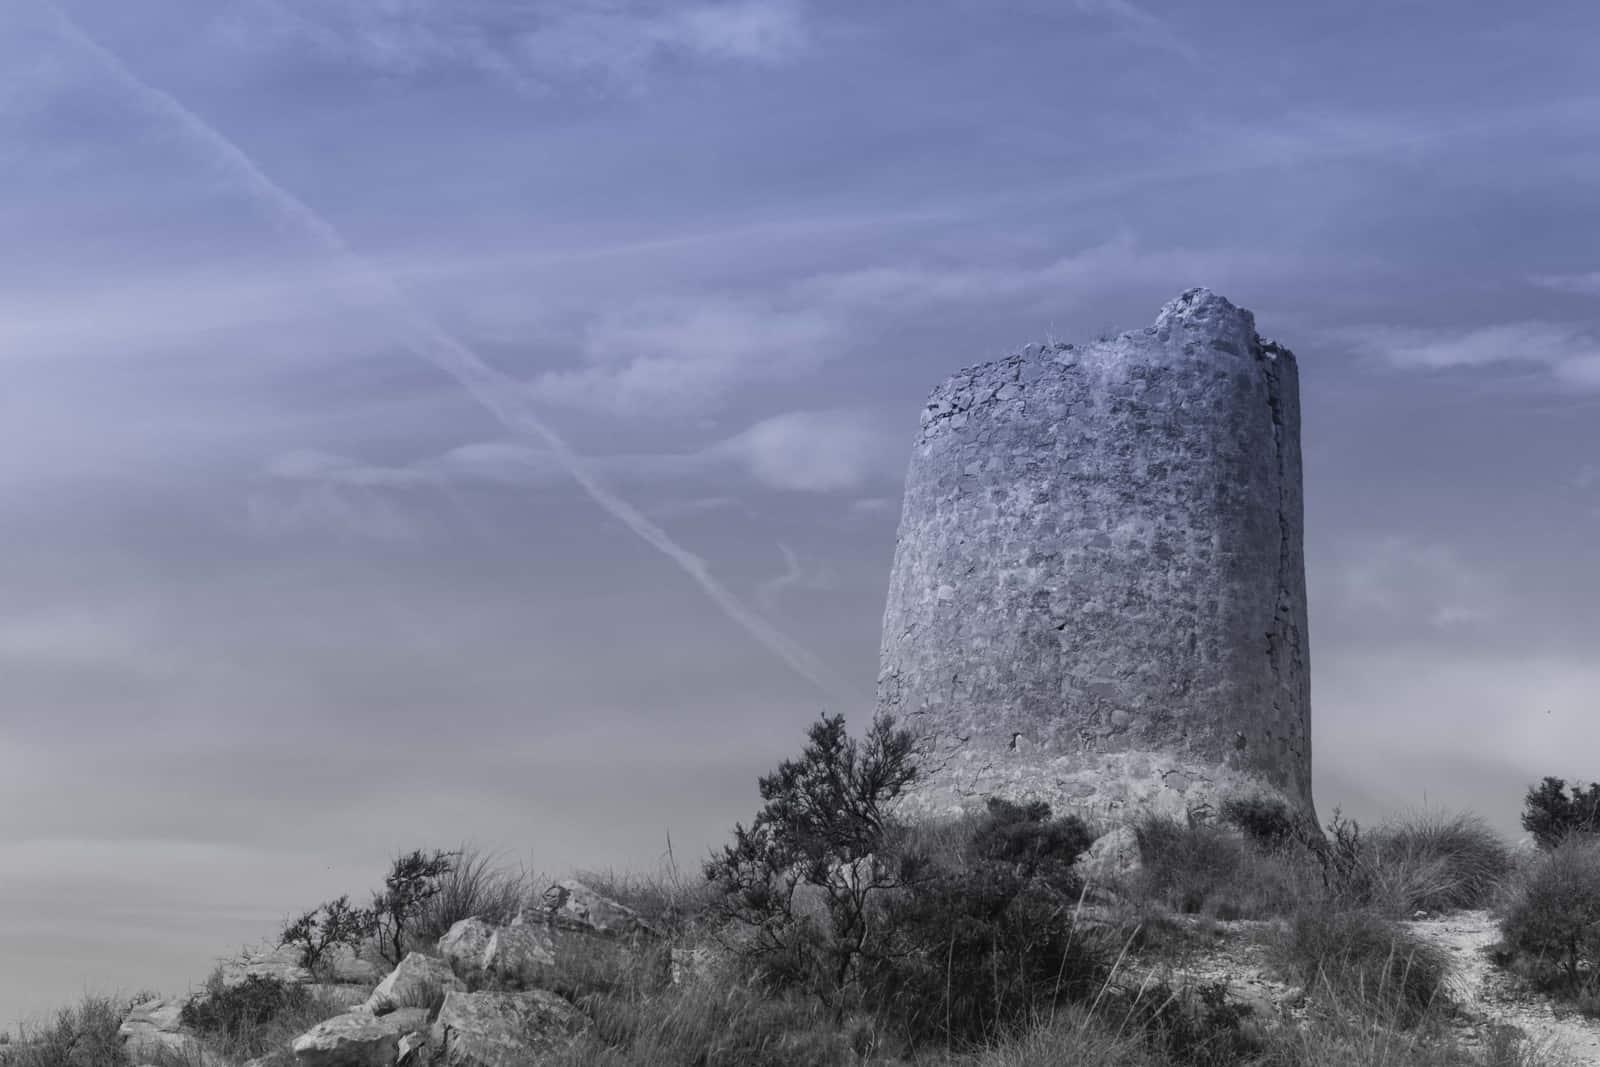 1495542046_torre de reixes en blanco y negro